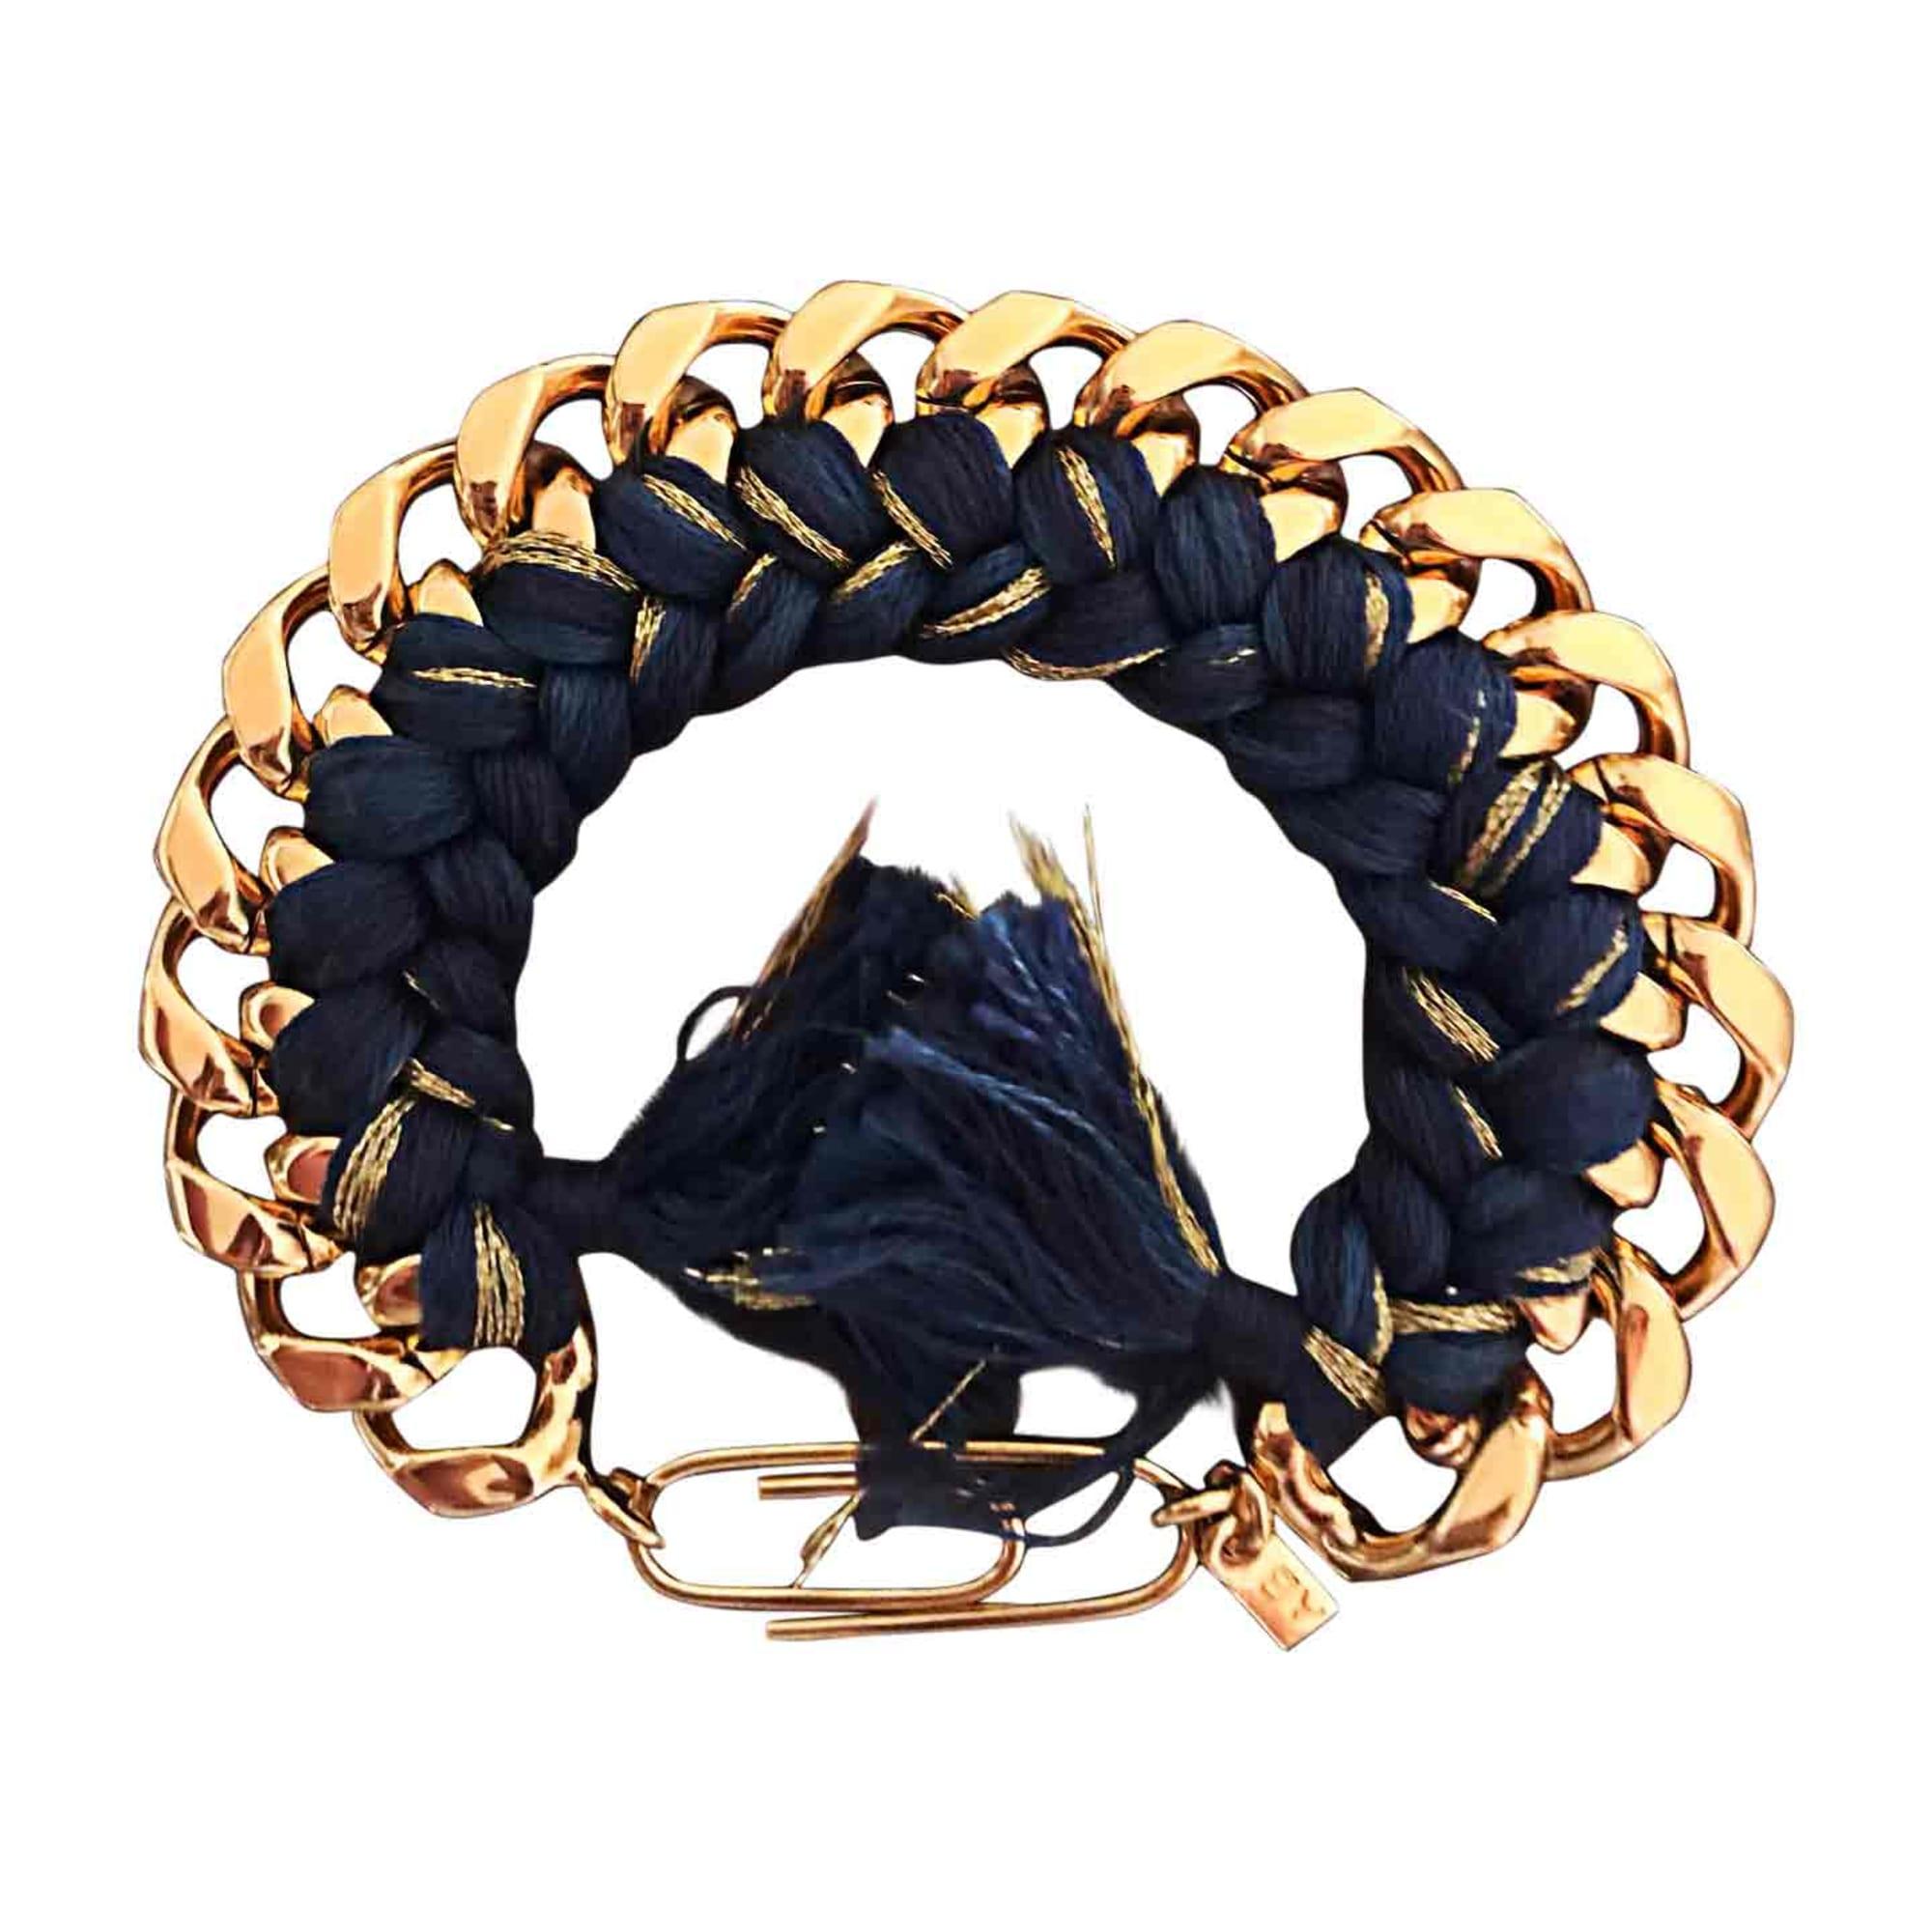 Bracelet AURELIE BIDERMANN Golden, bronze, copper